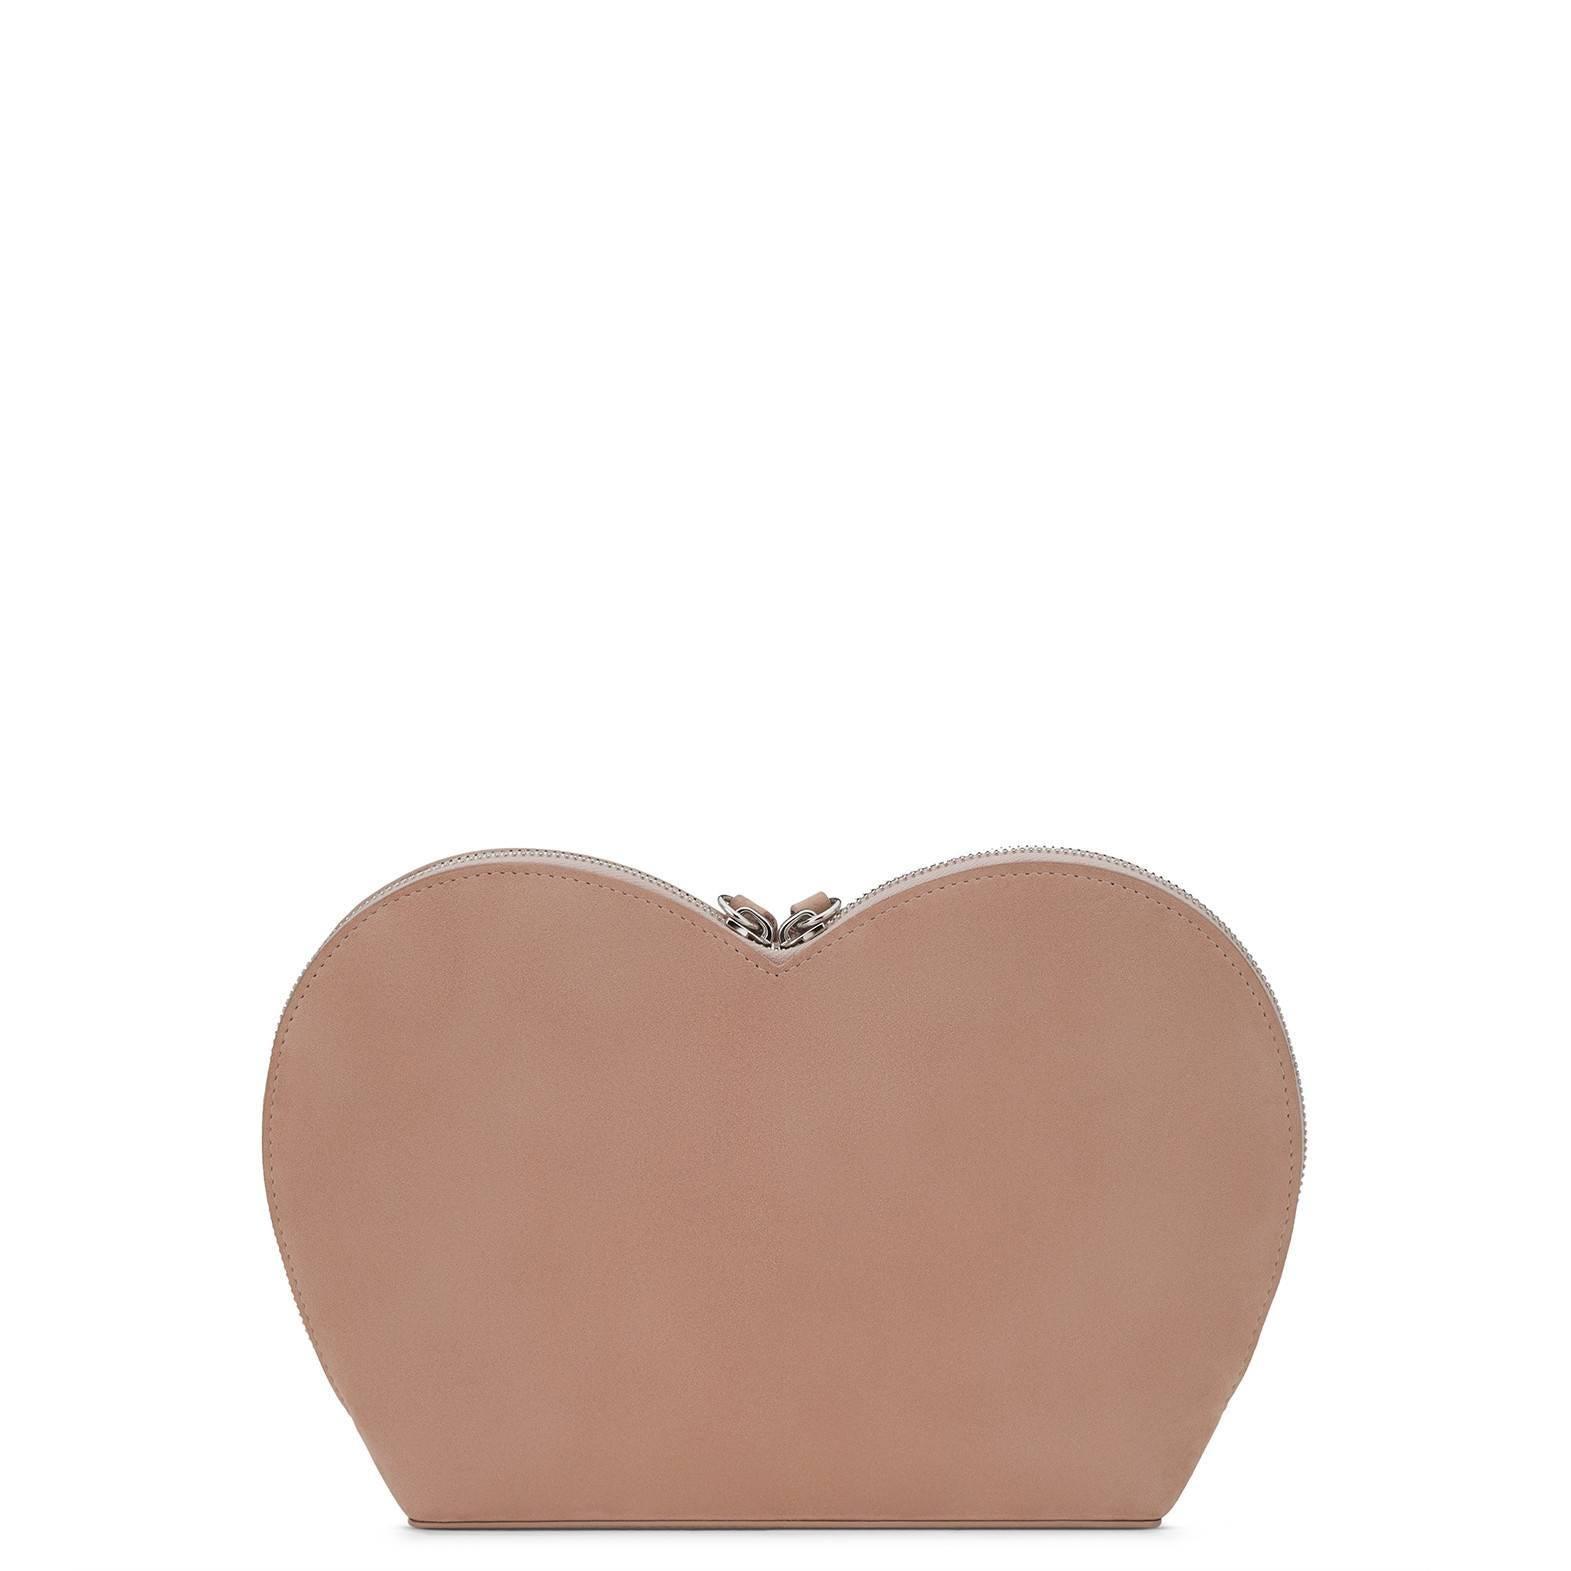 Giuseppe Zanotti Logo Blush Suede Dual Tassel Evening Clutch Bag e629xbRvI9